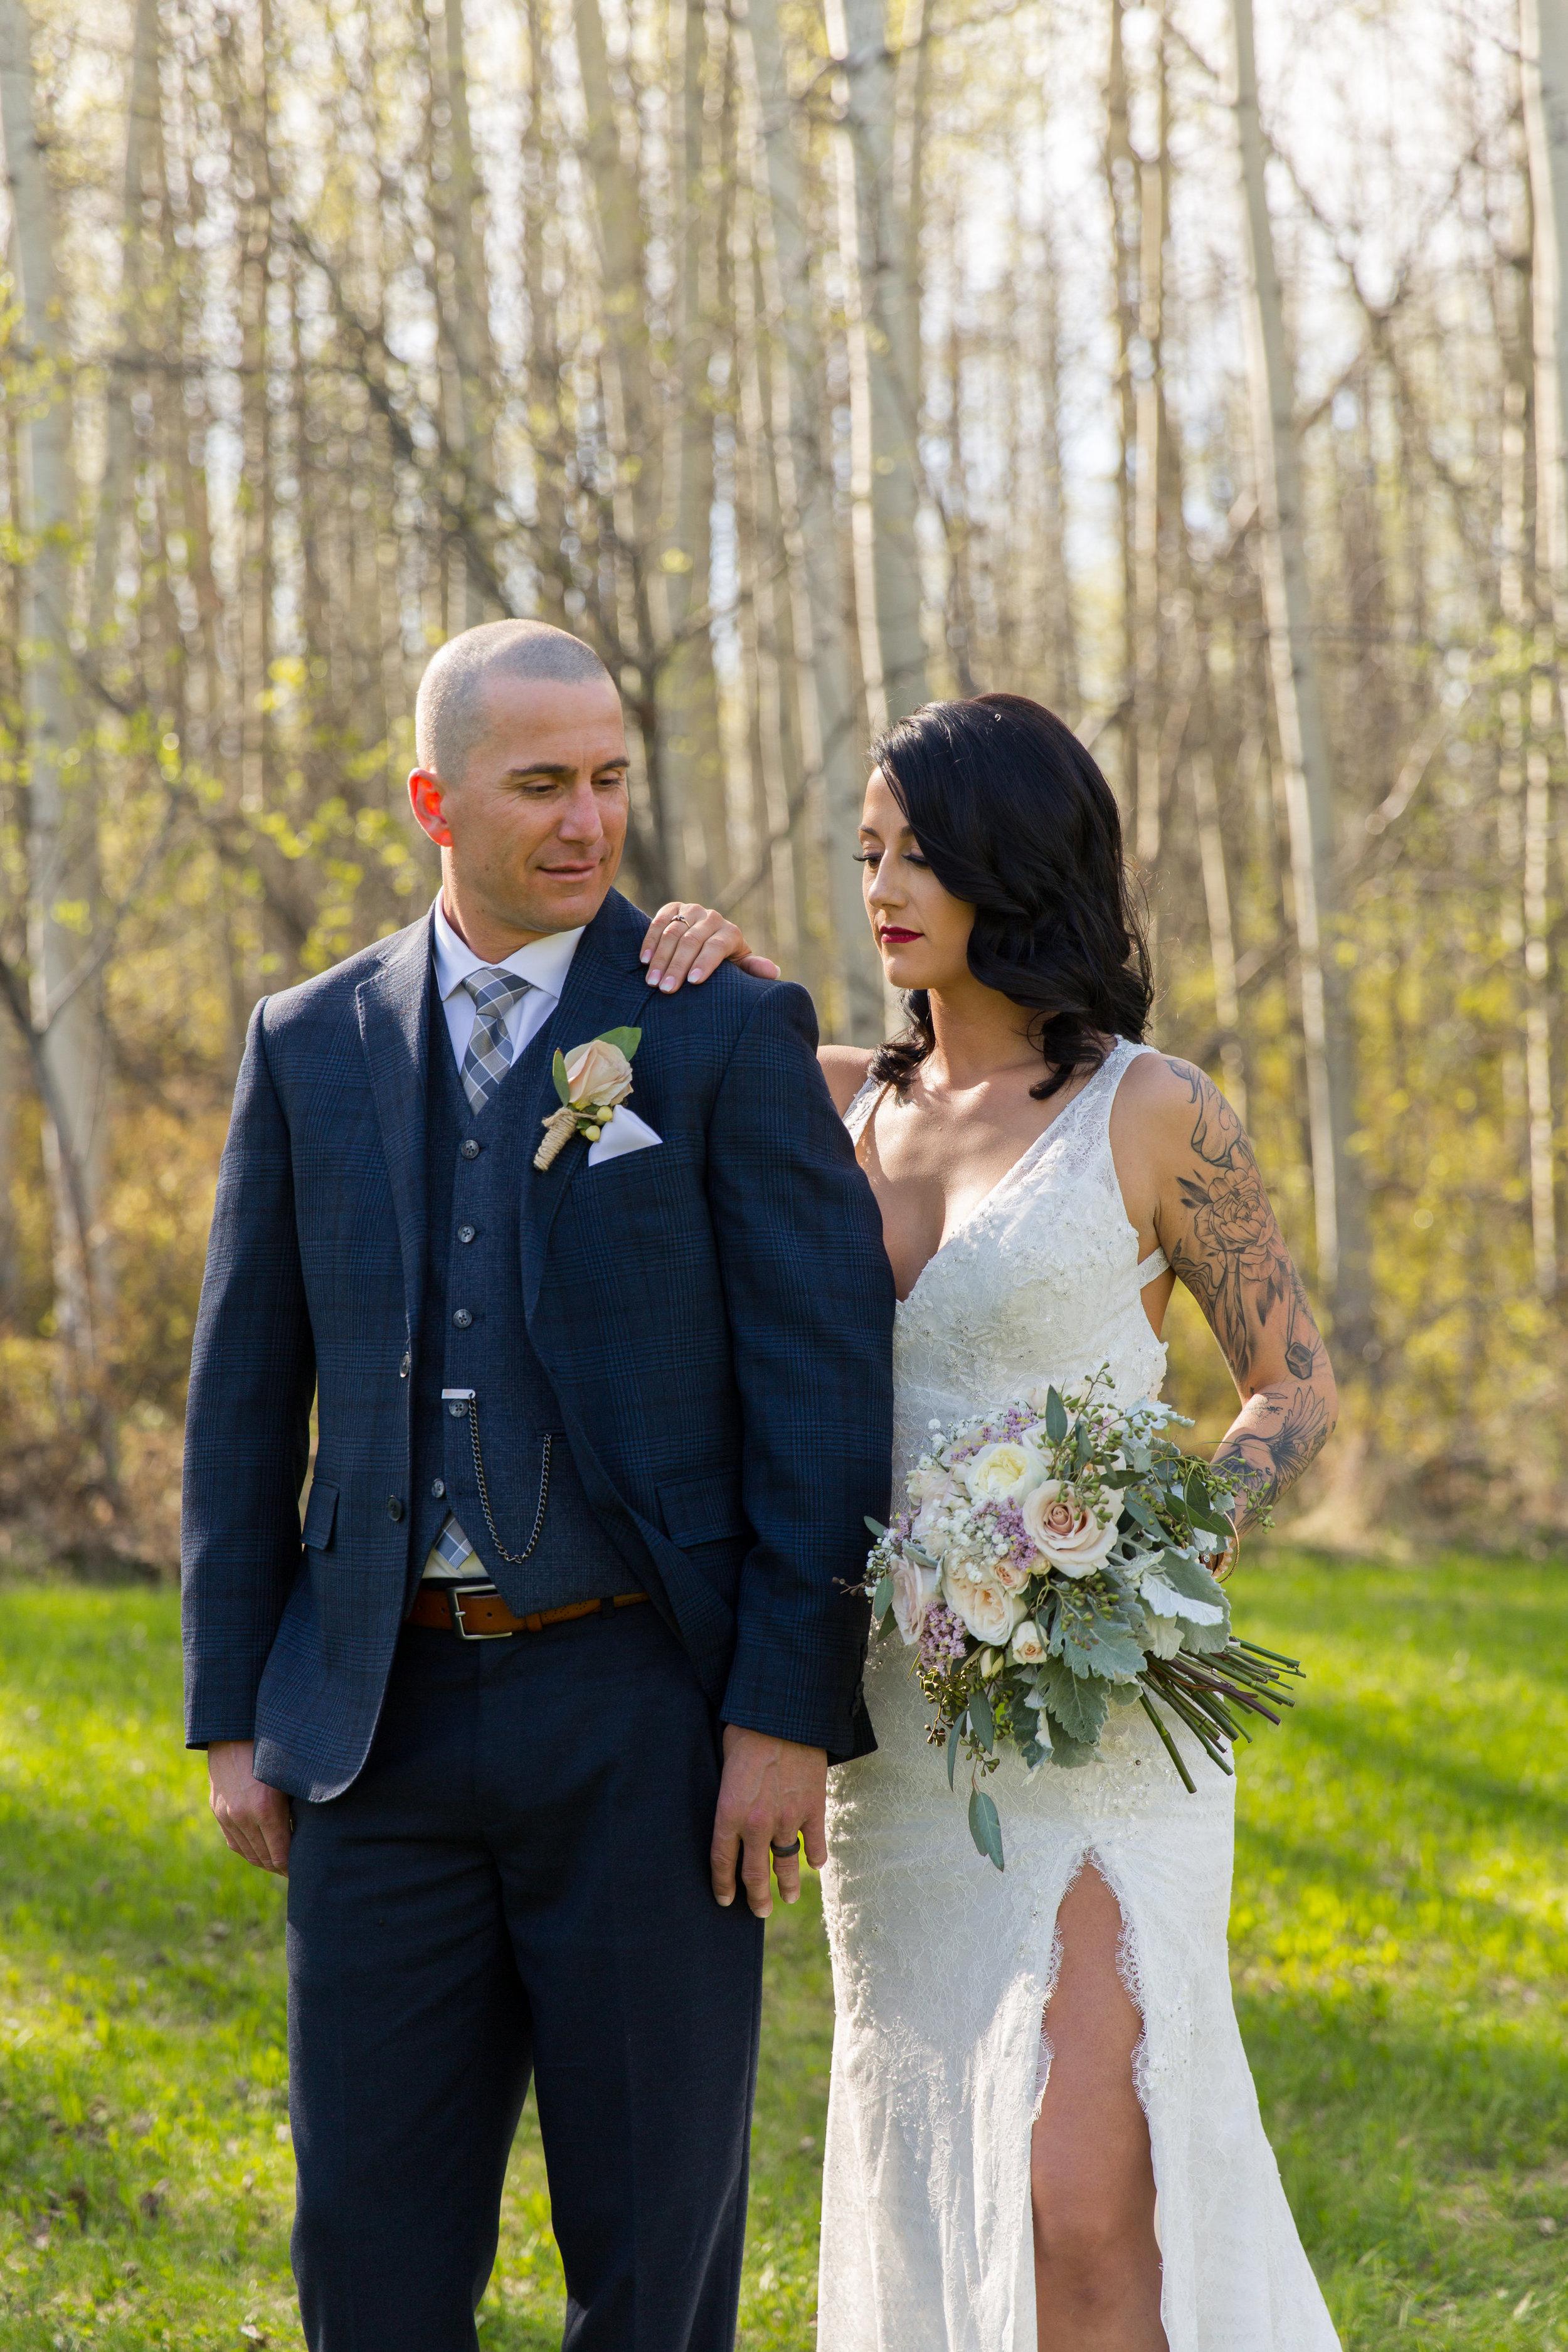 natural wedding flowers made custom in calgary, alberta